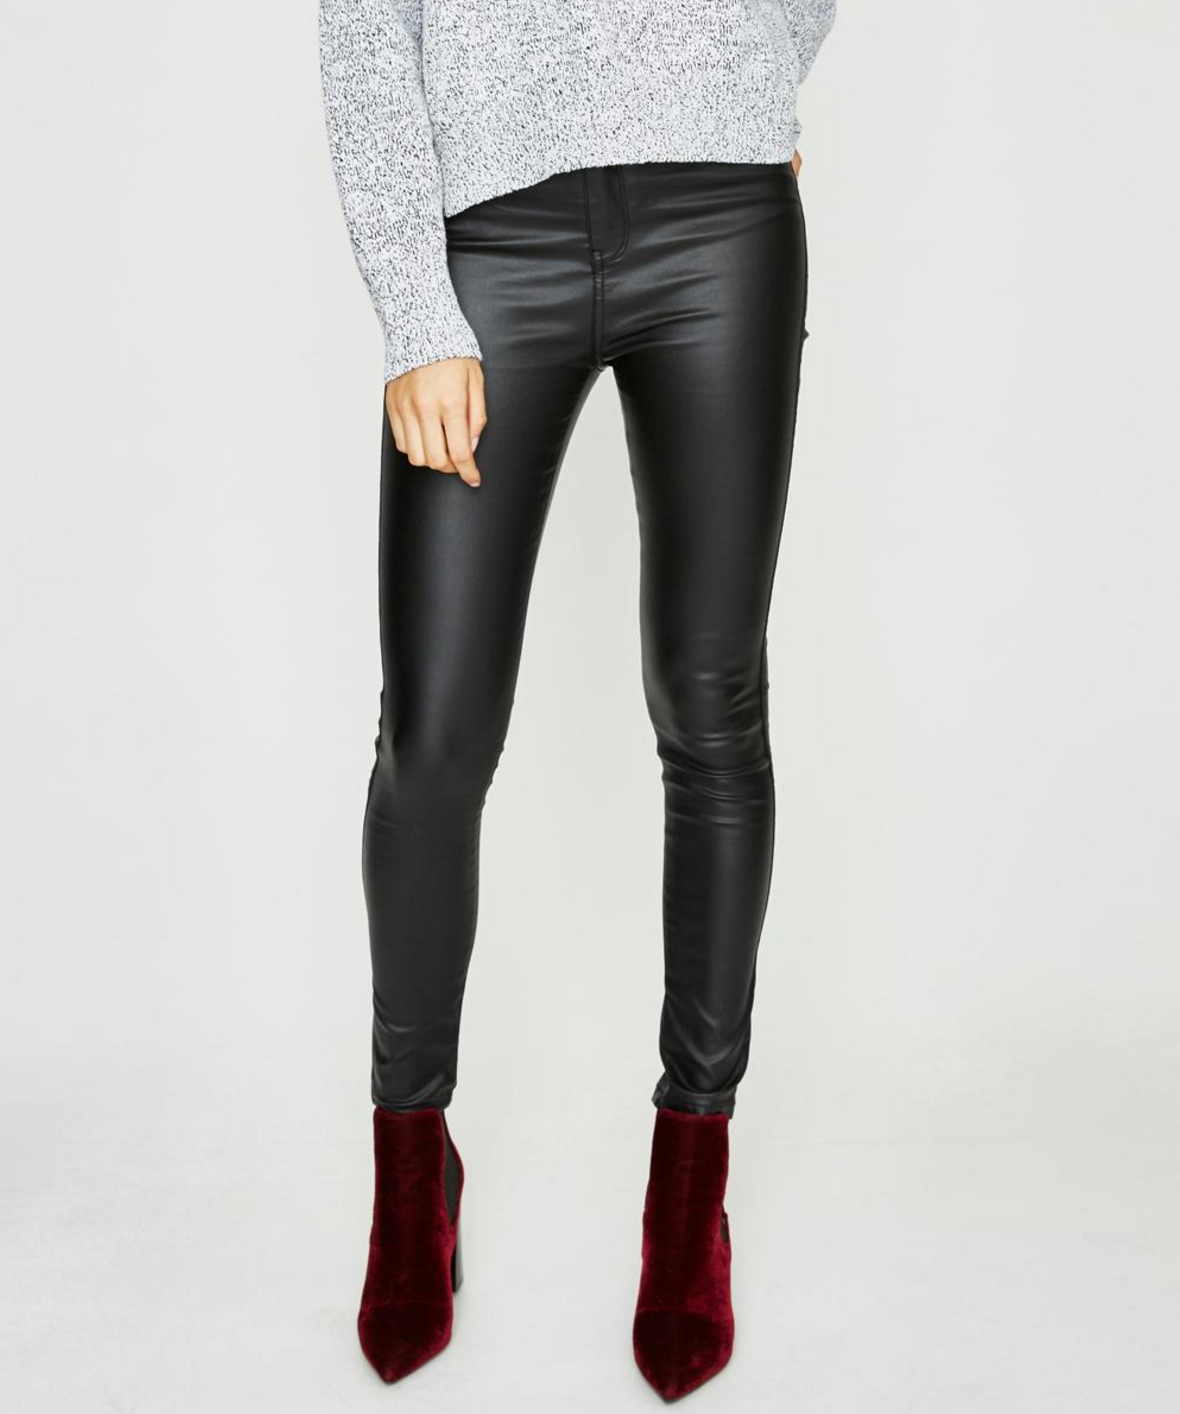 Neon Hart Patti coated jeans $89.95